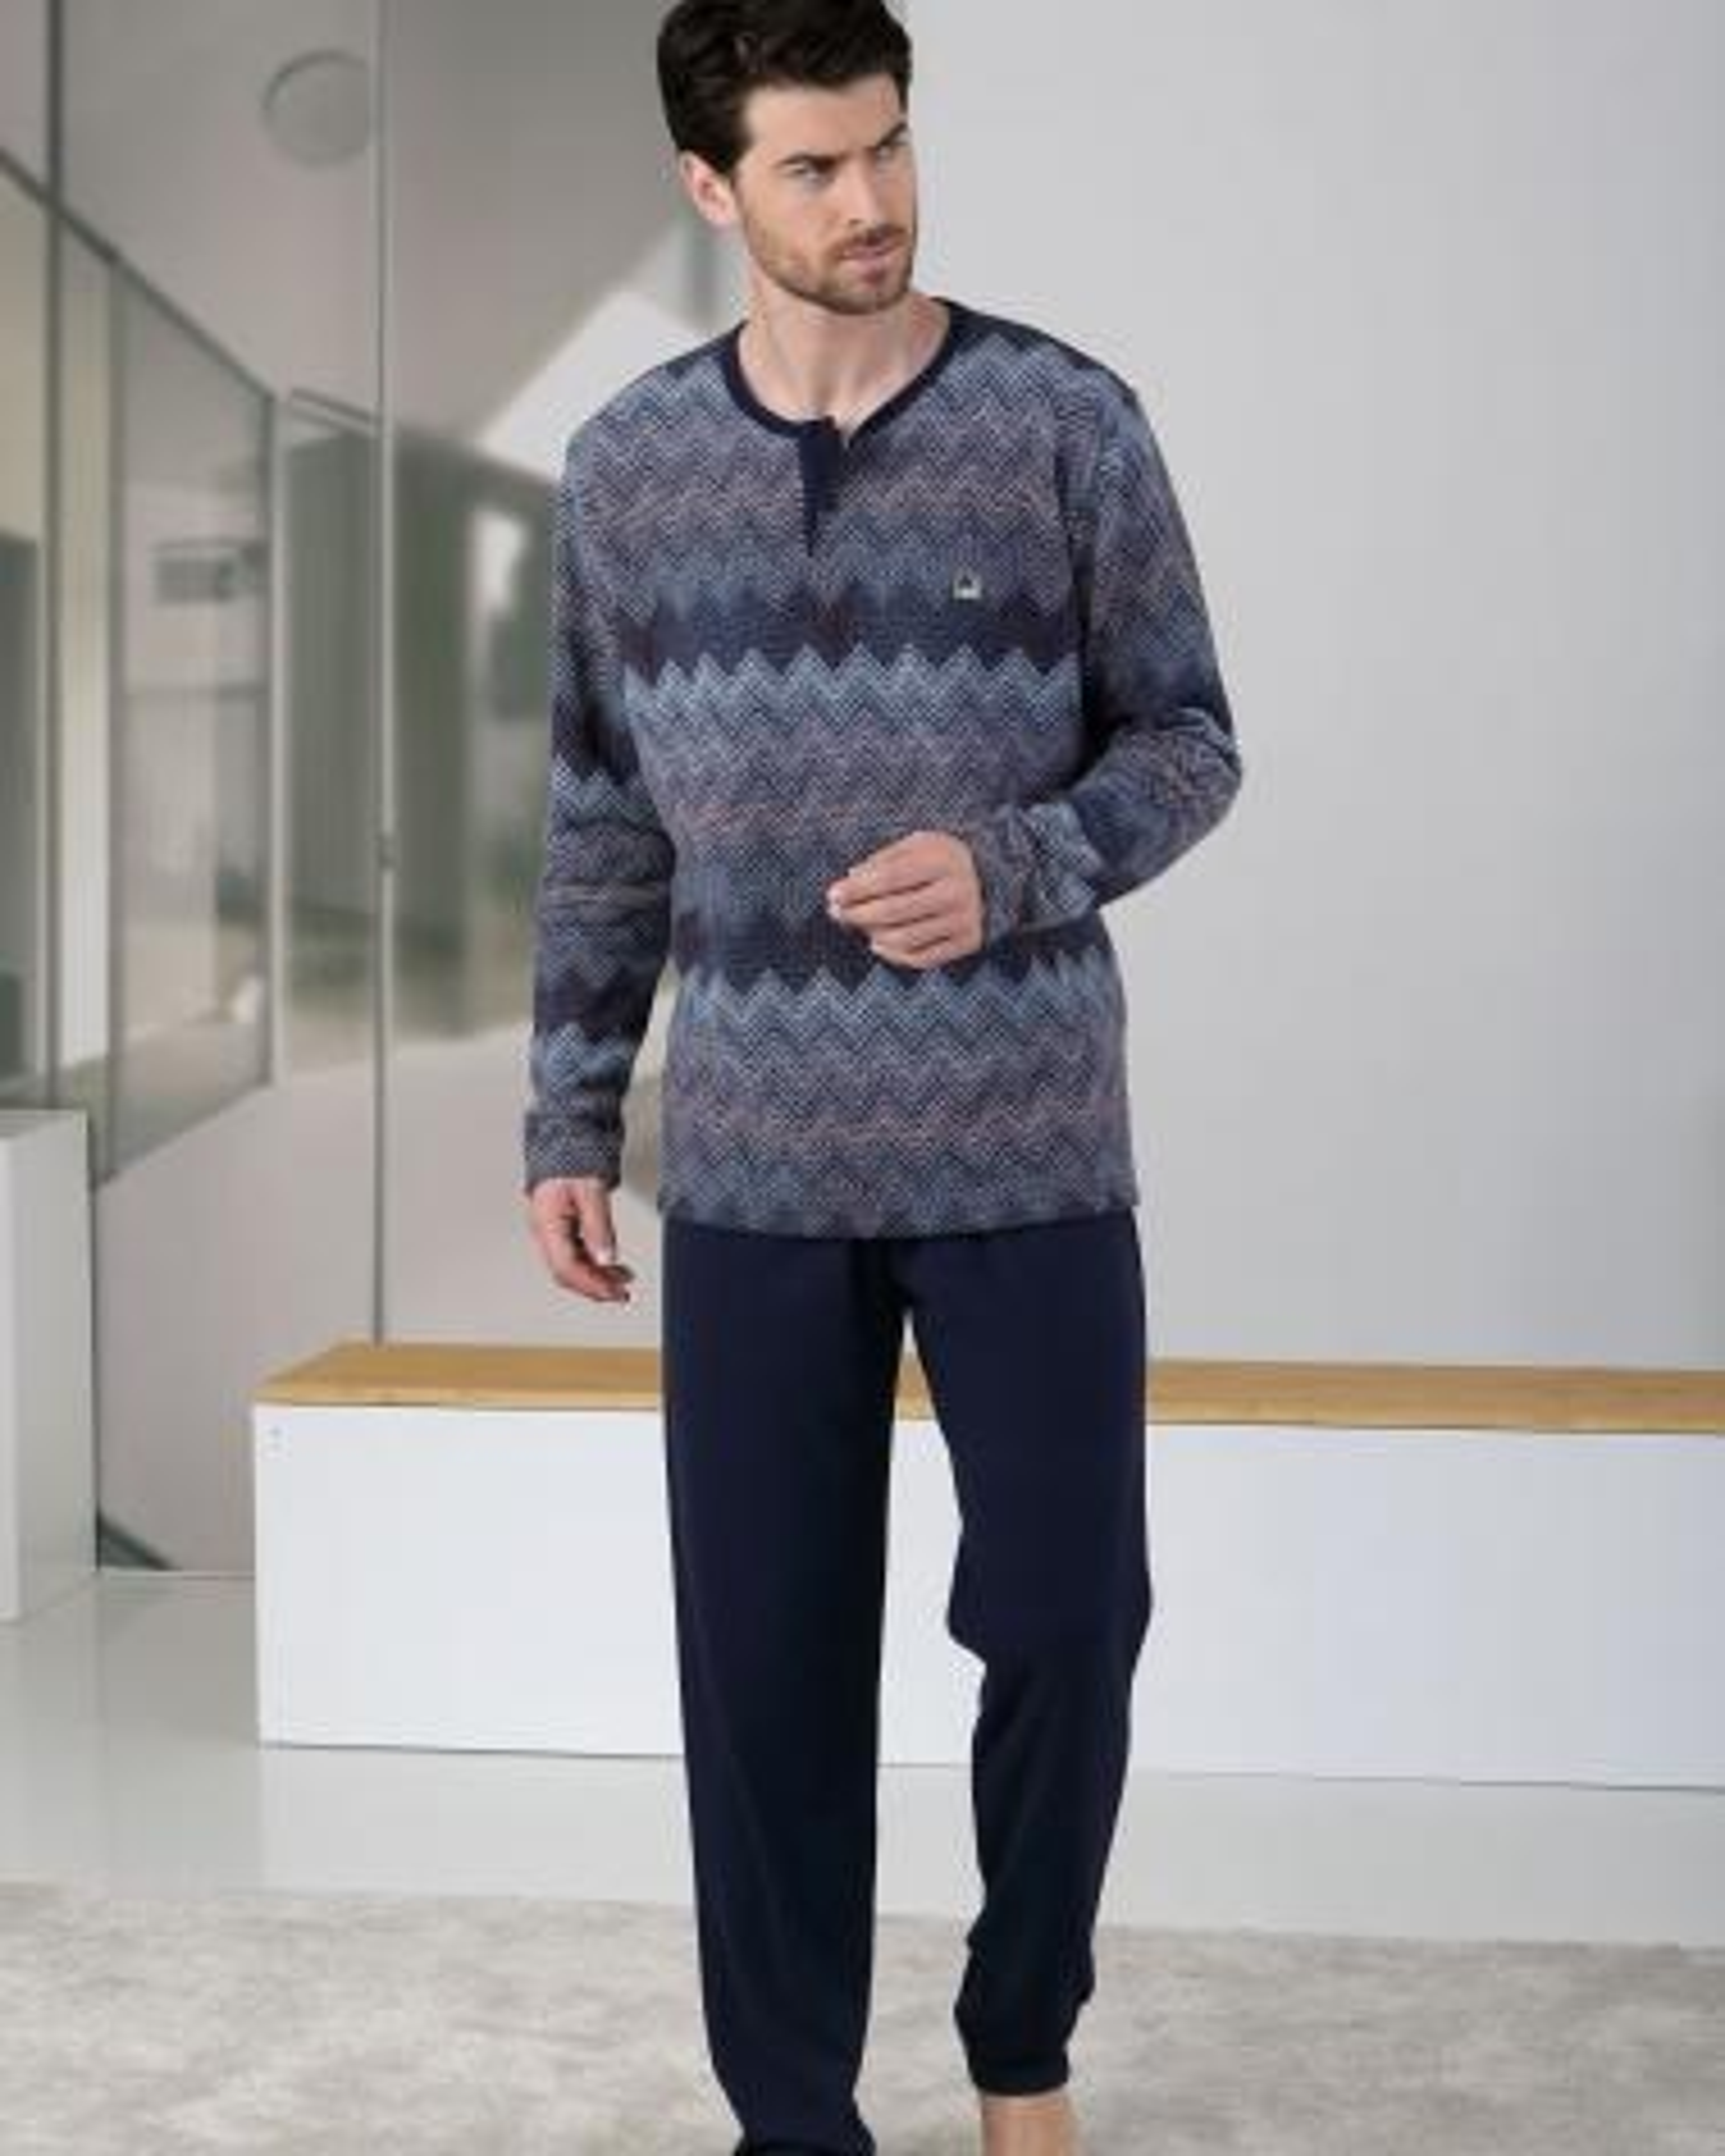 Pijama Caballero Picos Massana TALLAS: m, l; COLOR: azul  - HOMBRE  - PEPI GUERRA